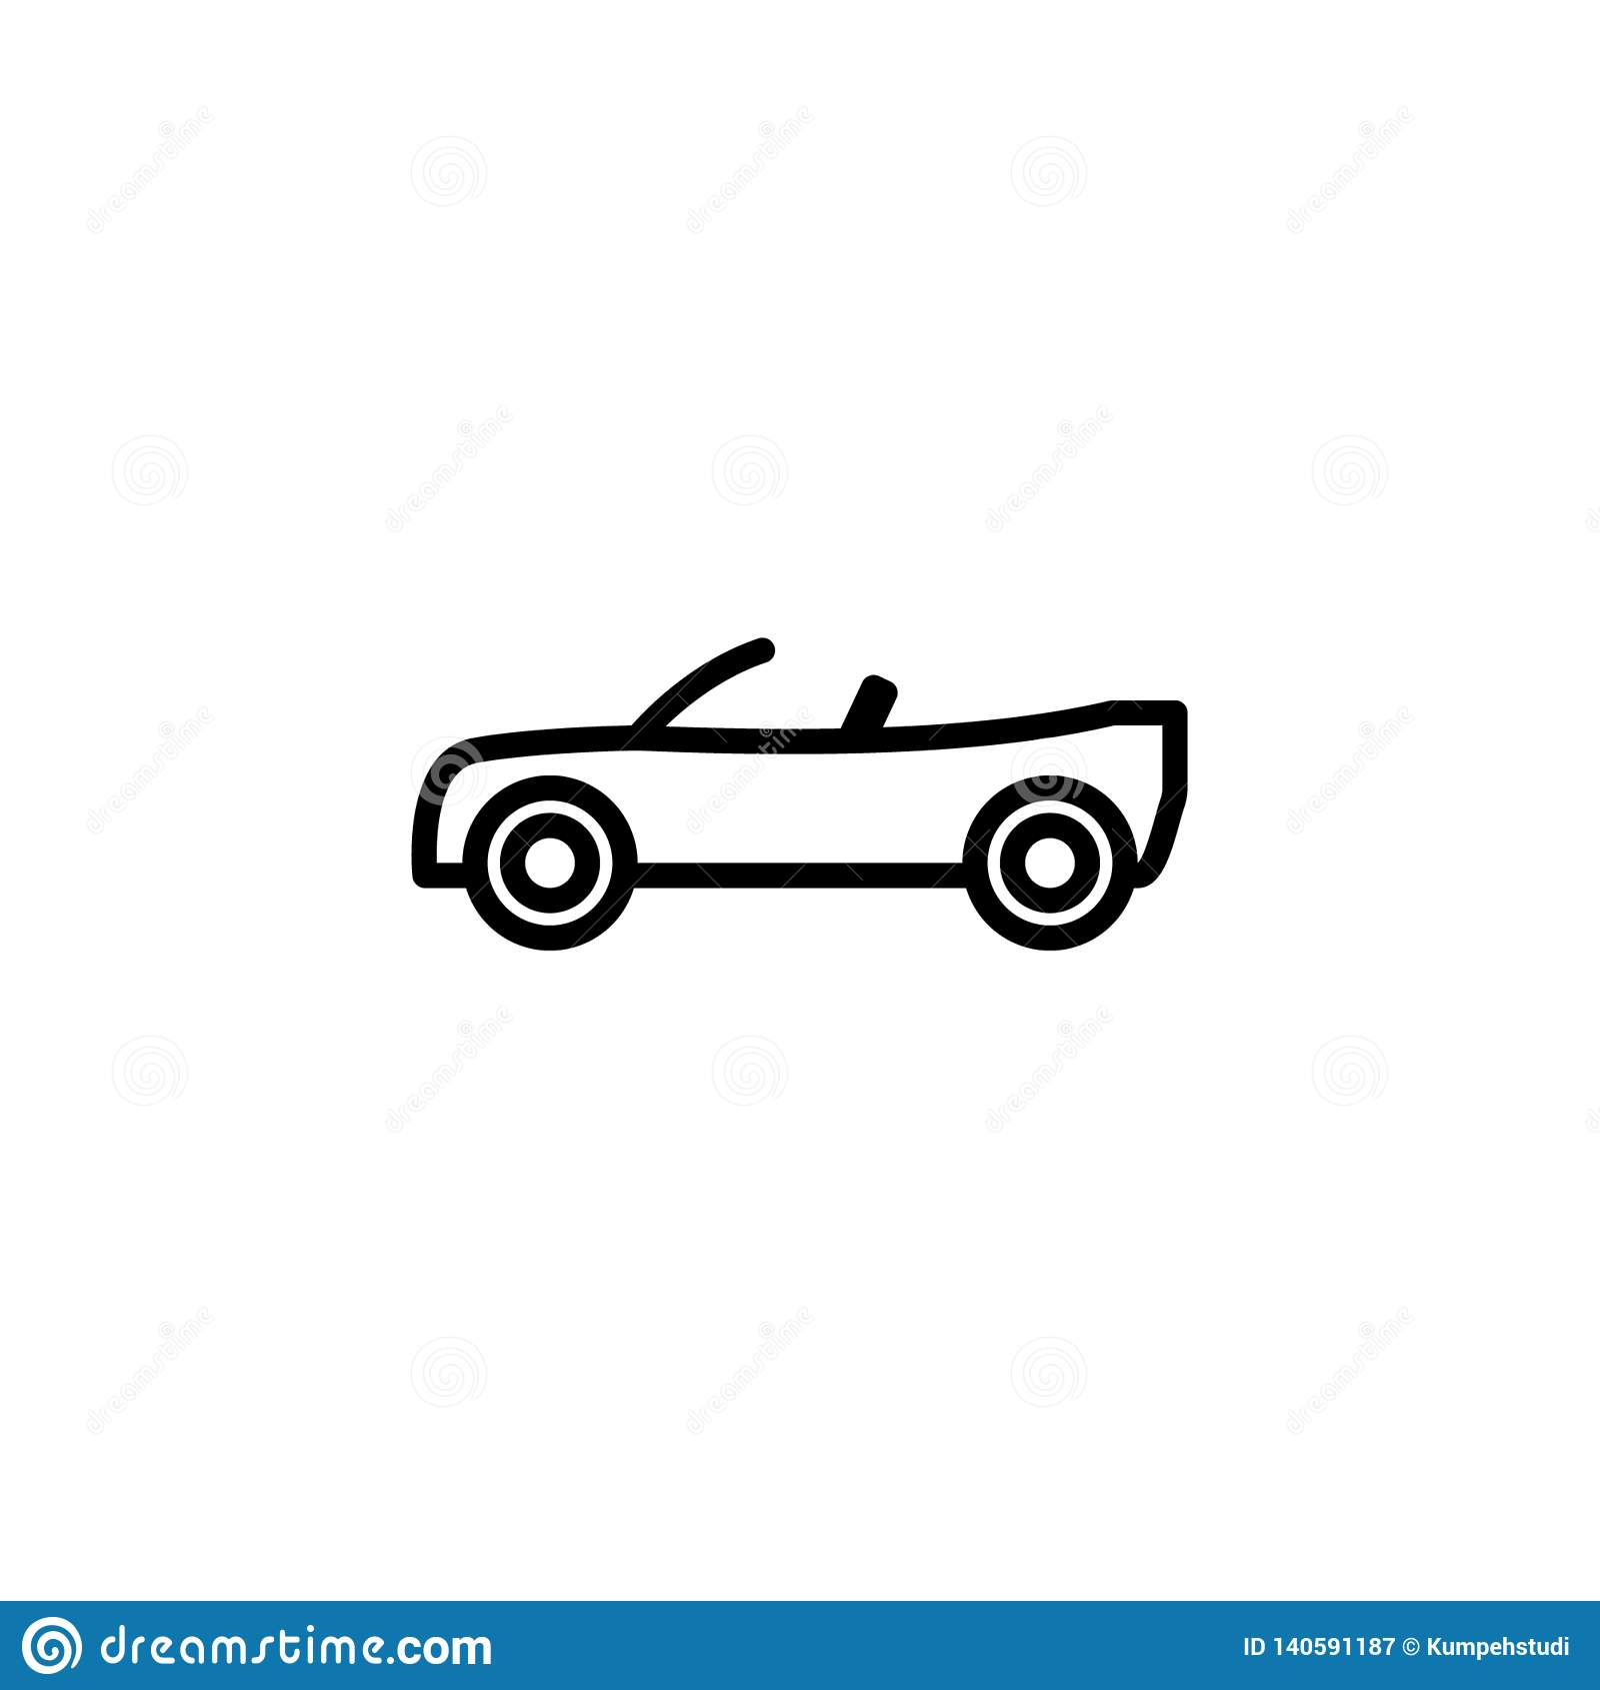 Konvertierbare Autoikonenaktie des Transporter lokalisierten Vektors